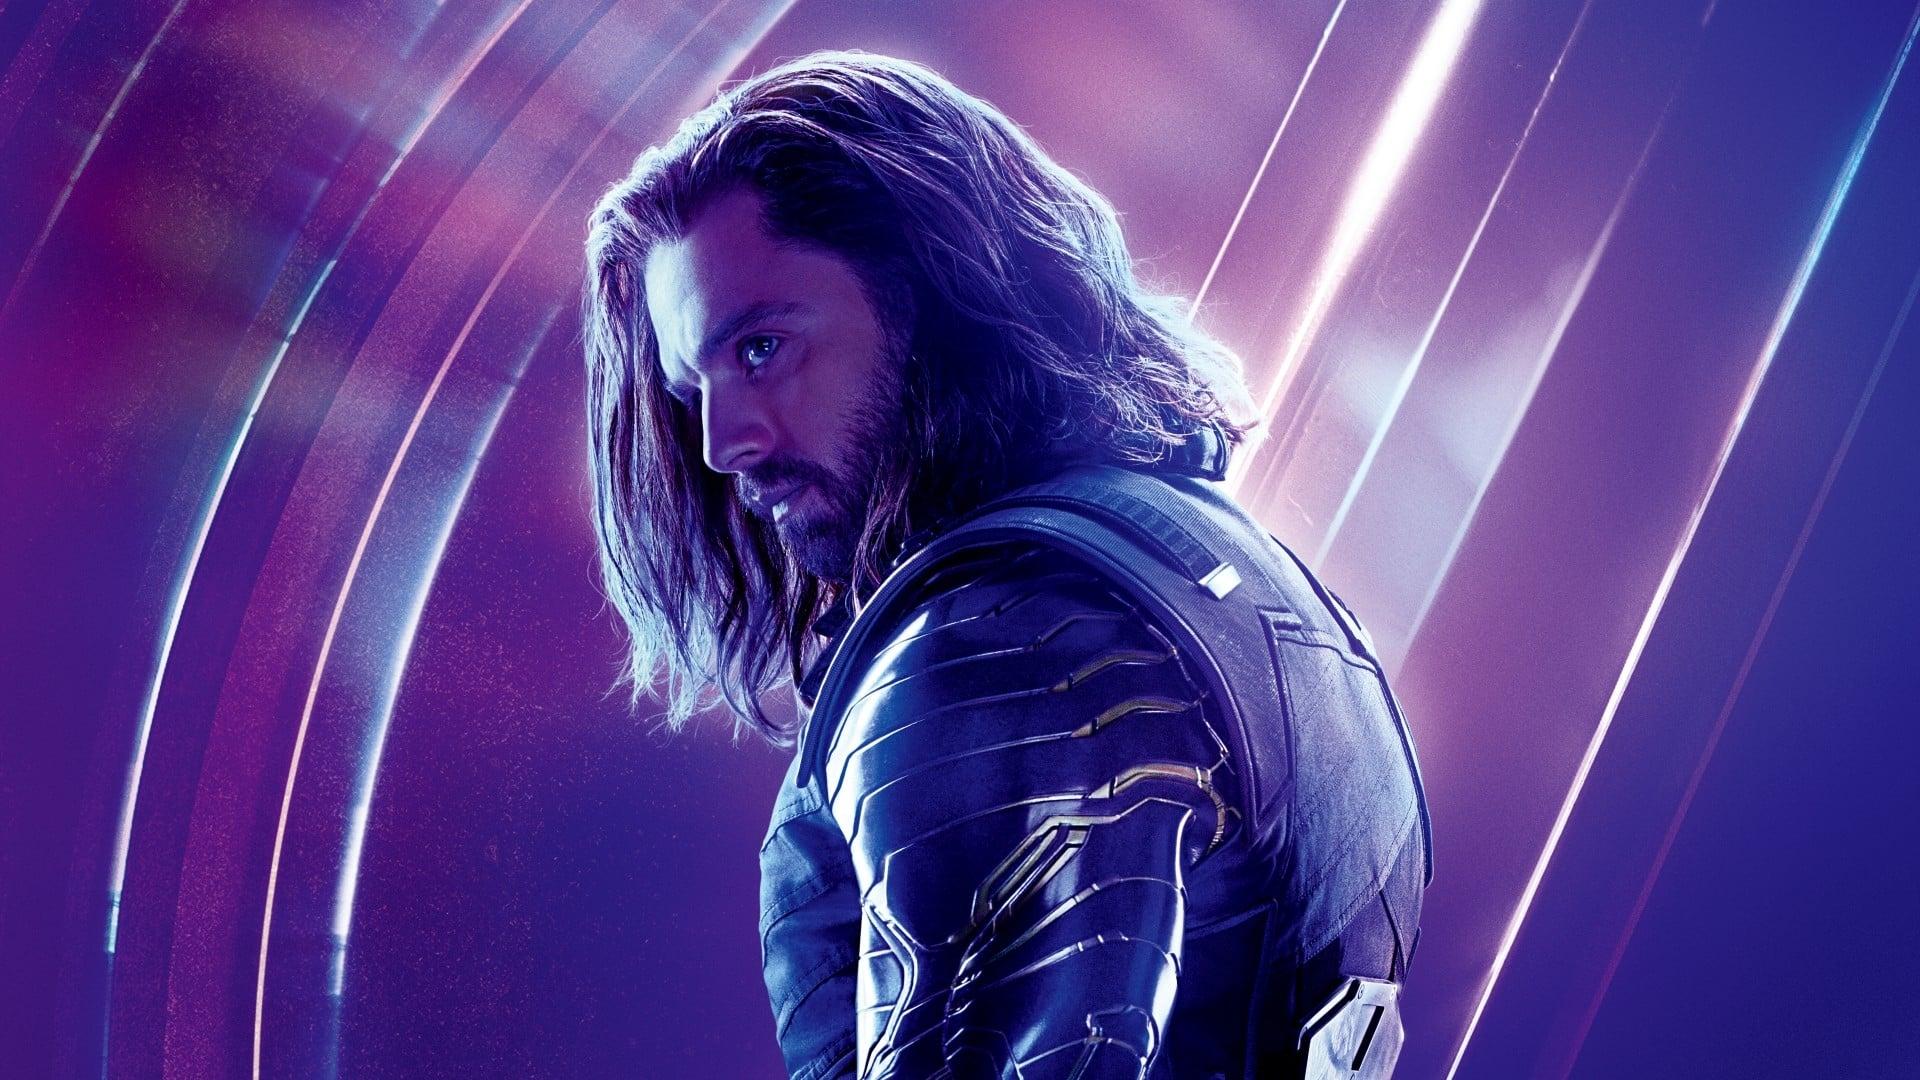 Watch Avengers: Infinity War 2018 Movies Online